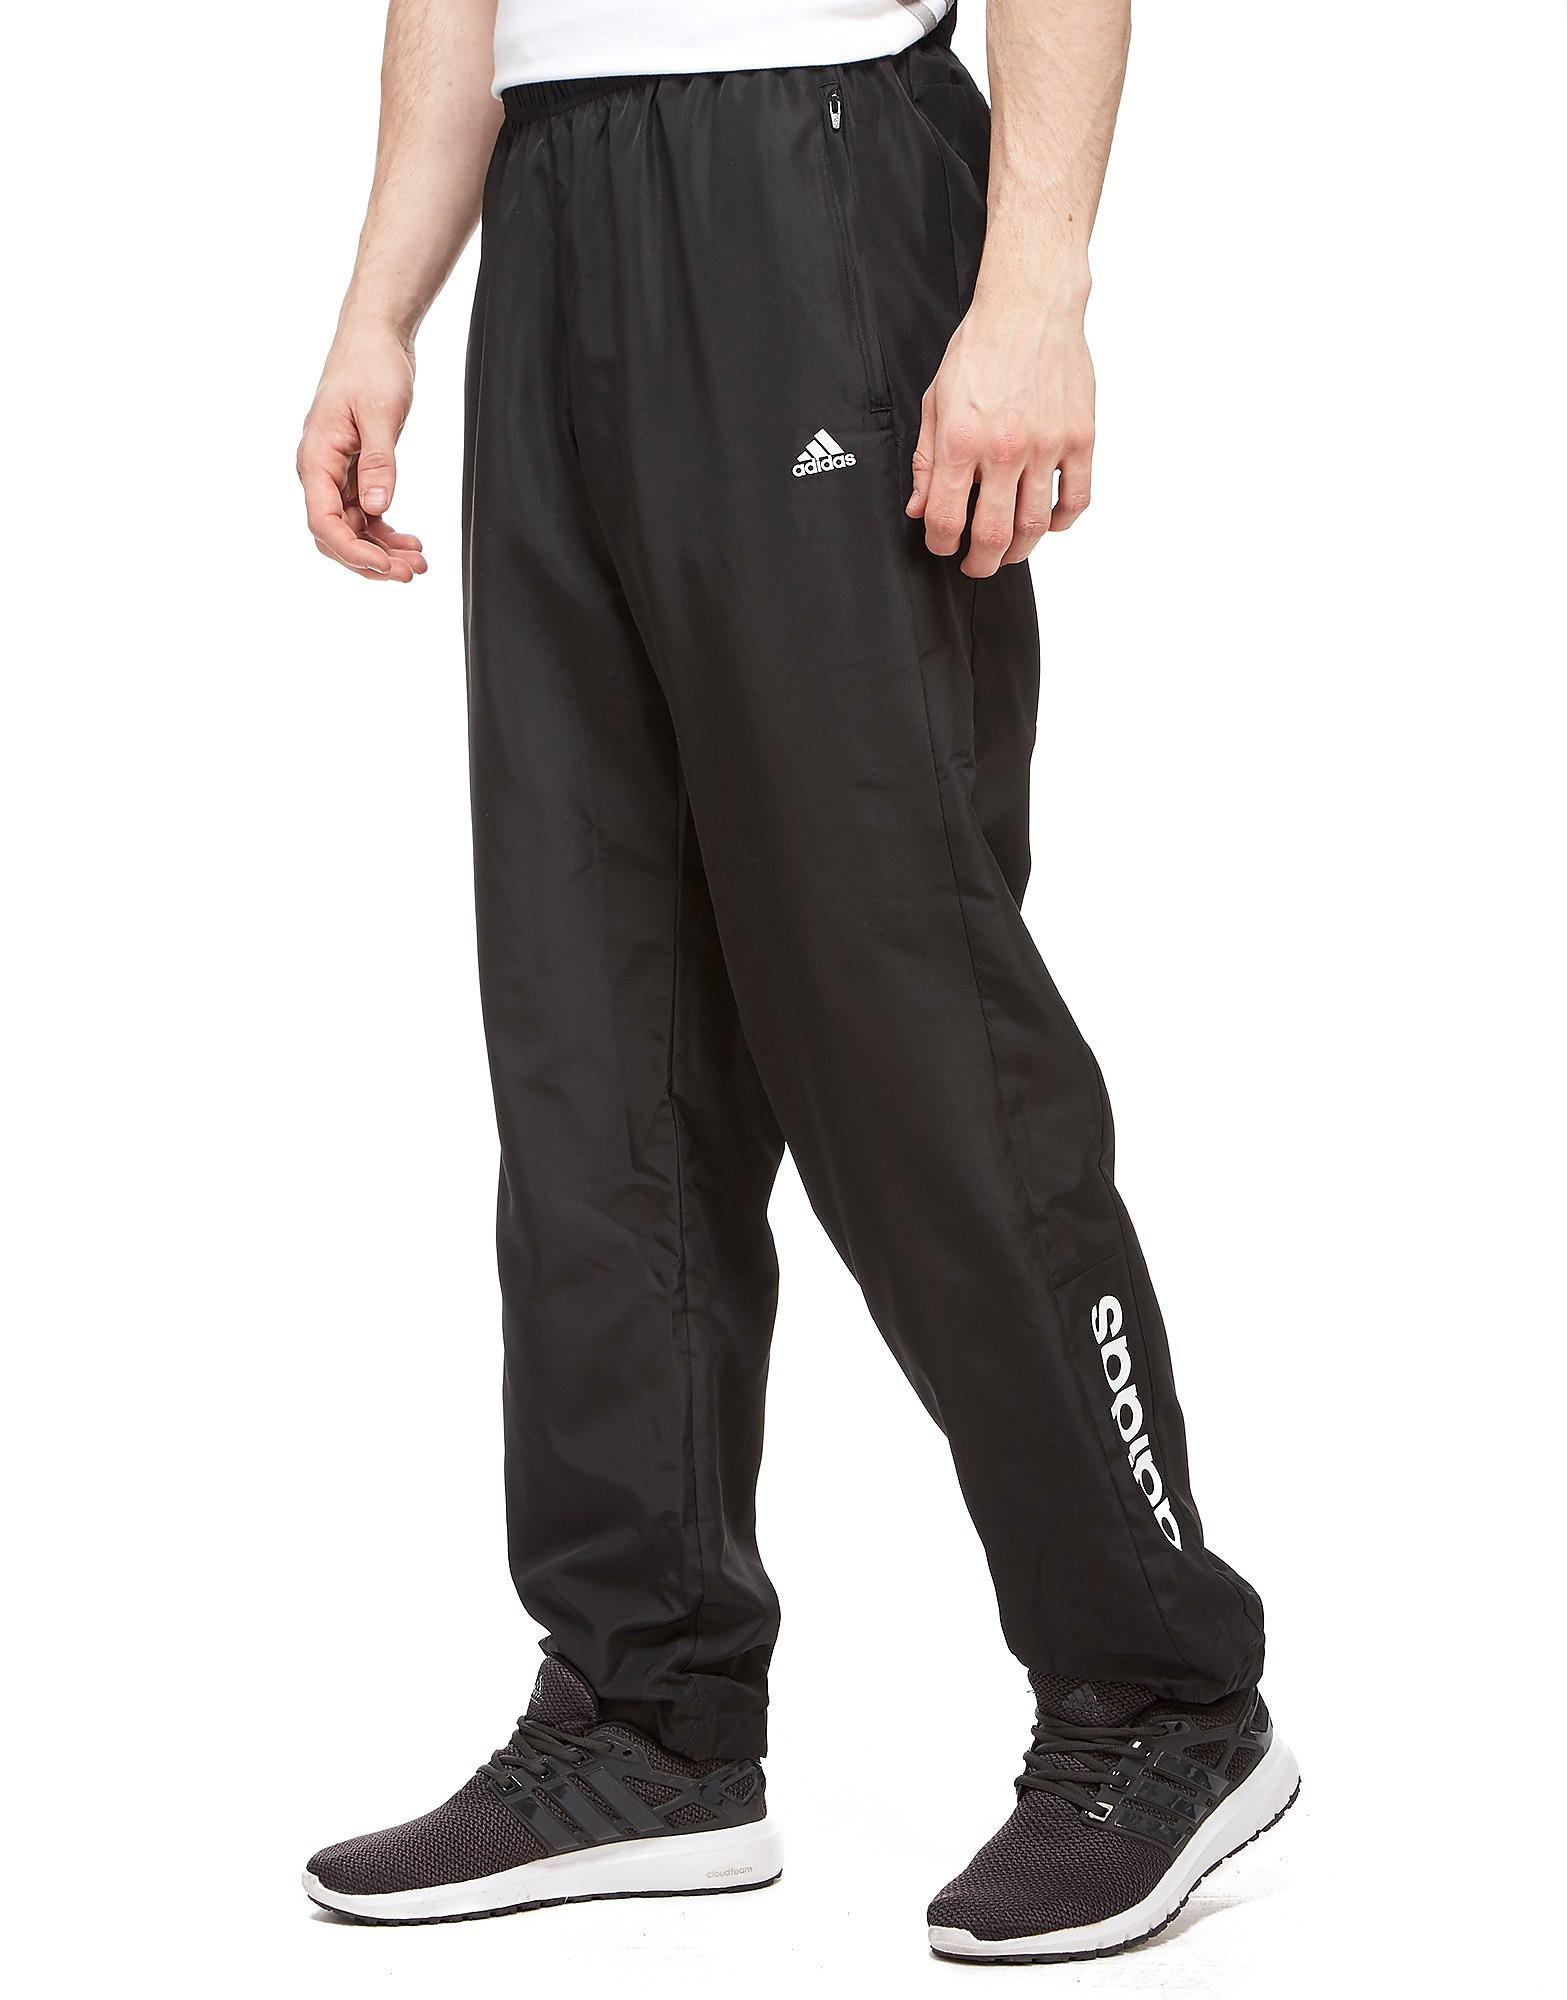 adidas KP7 Woven-broek